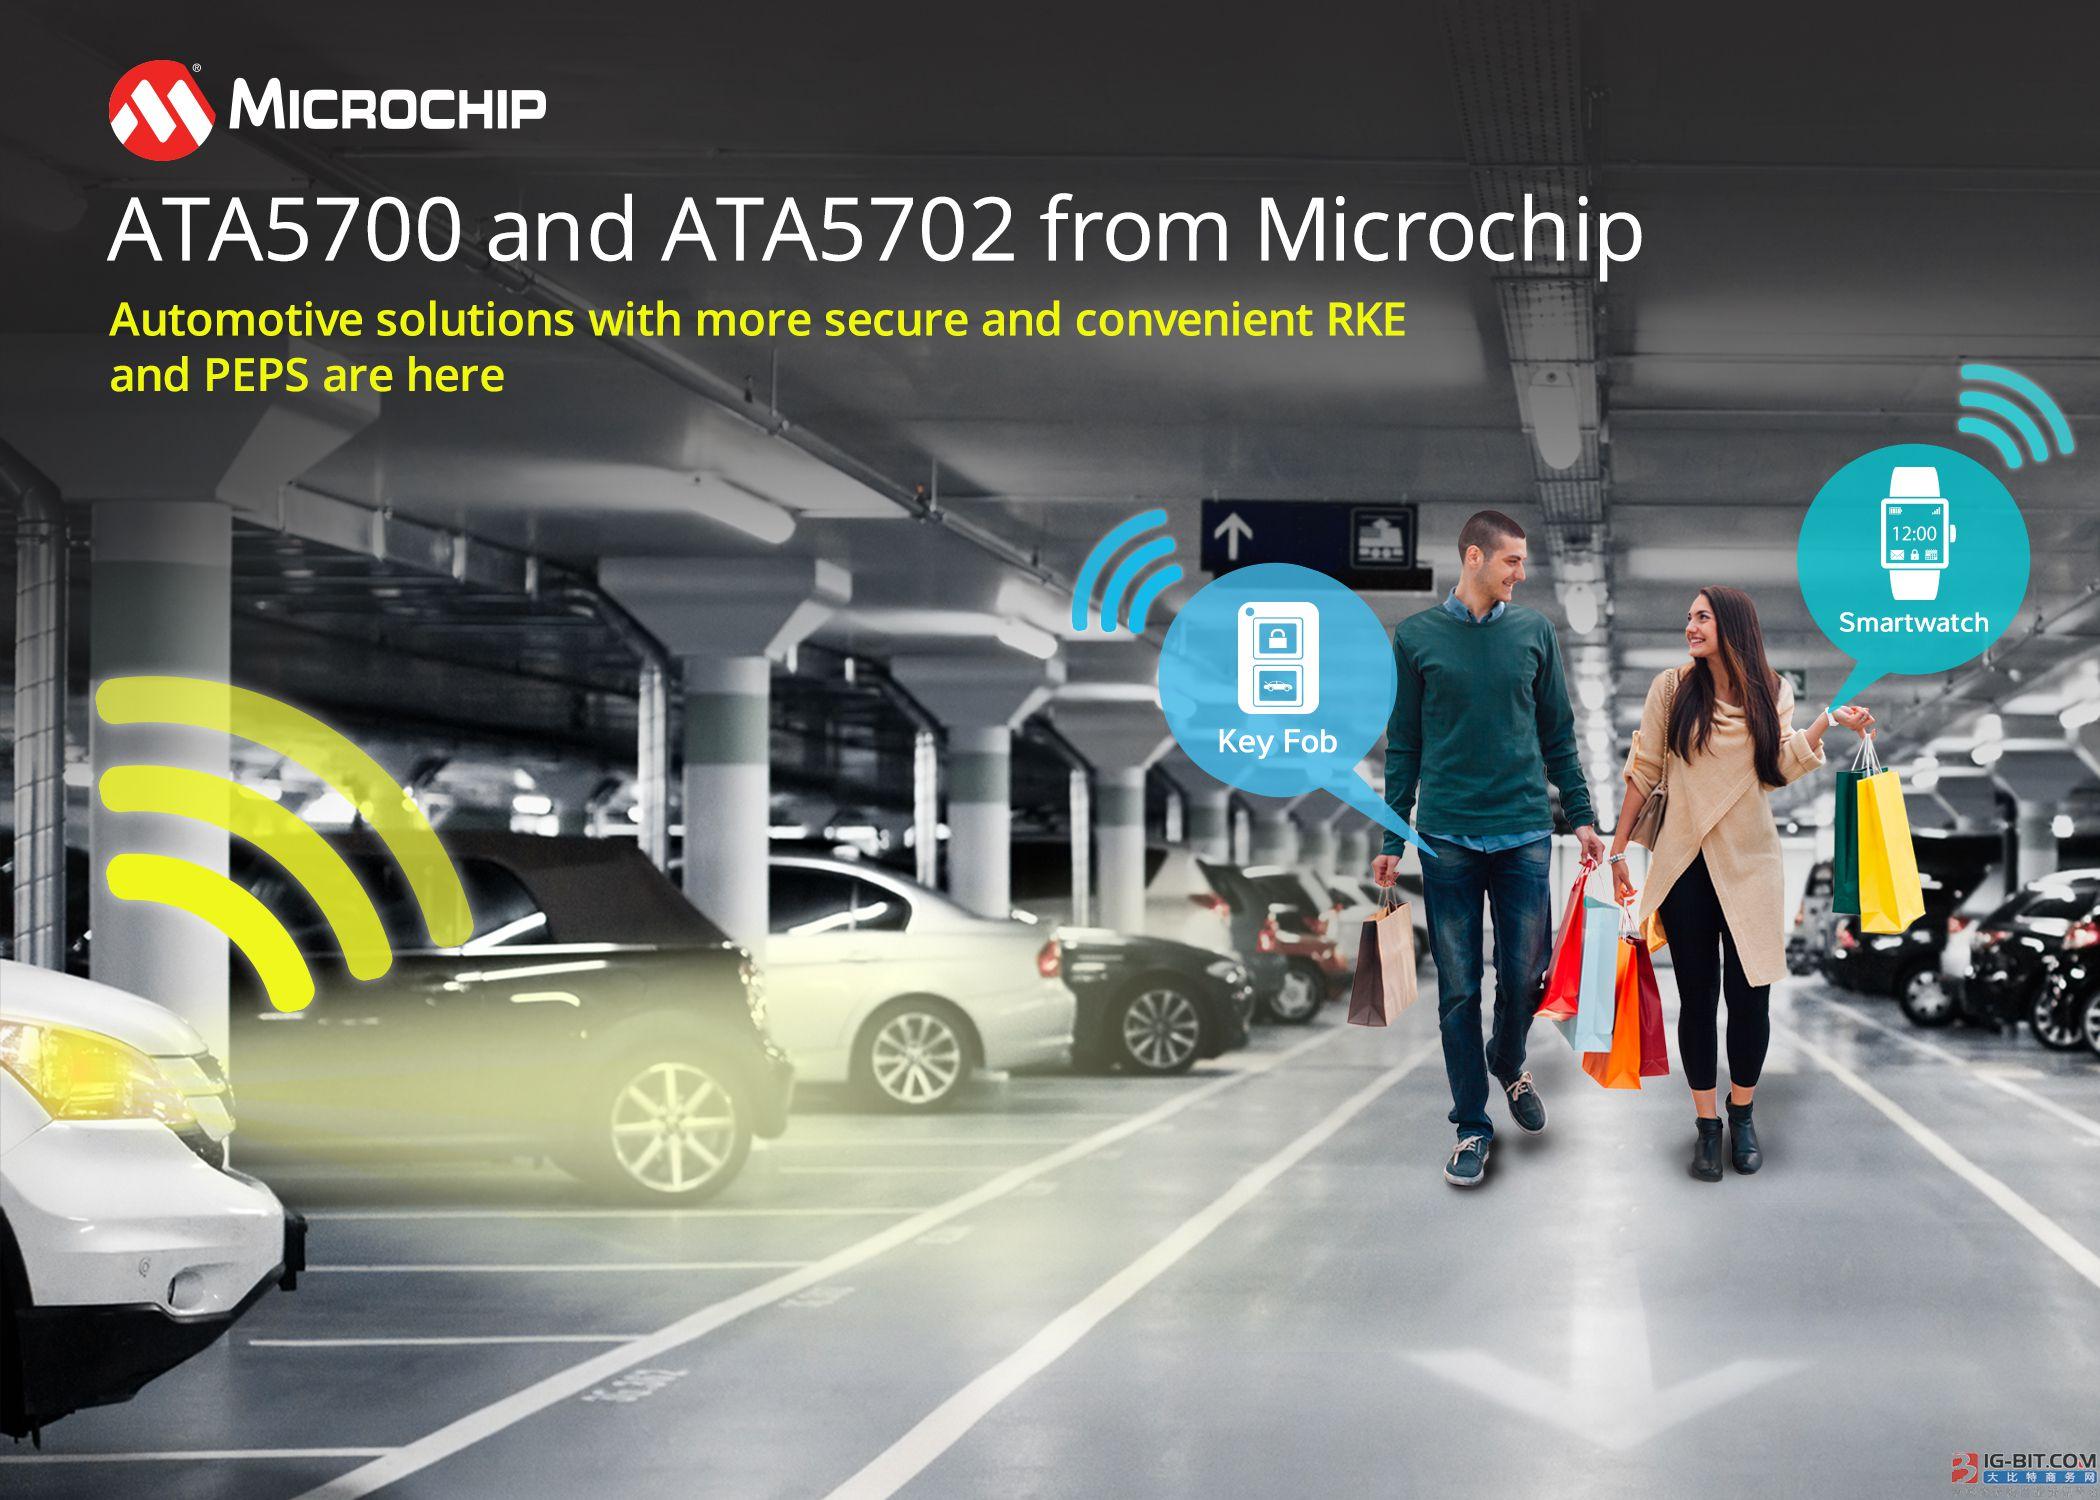 Microchip推出超低功耗汽车门禁解决方案,可用于智能钥匙和可穿戴设备